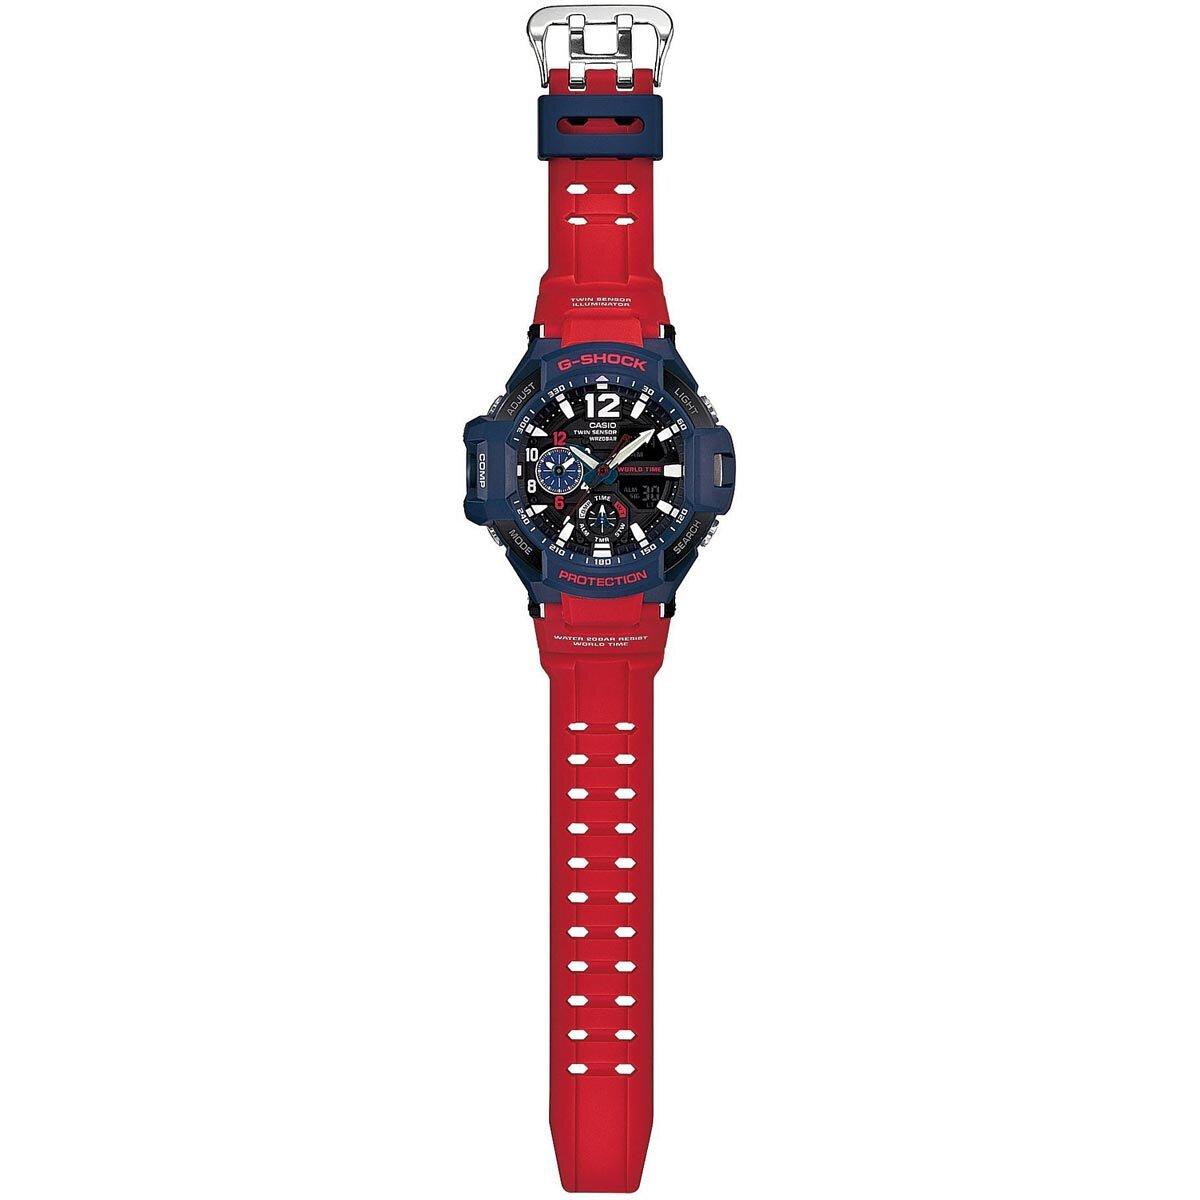 d825cf0c9 Buy Casio G-Shock GA-1100-2A Gravitymaster Men s Watch